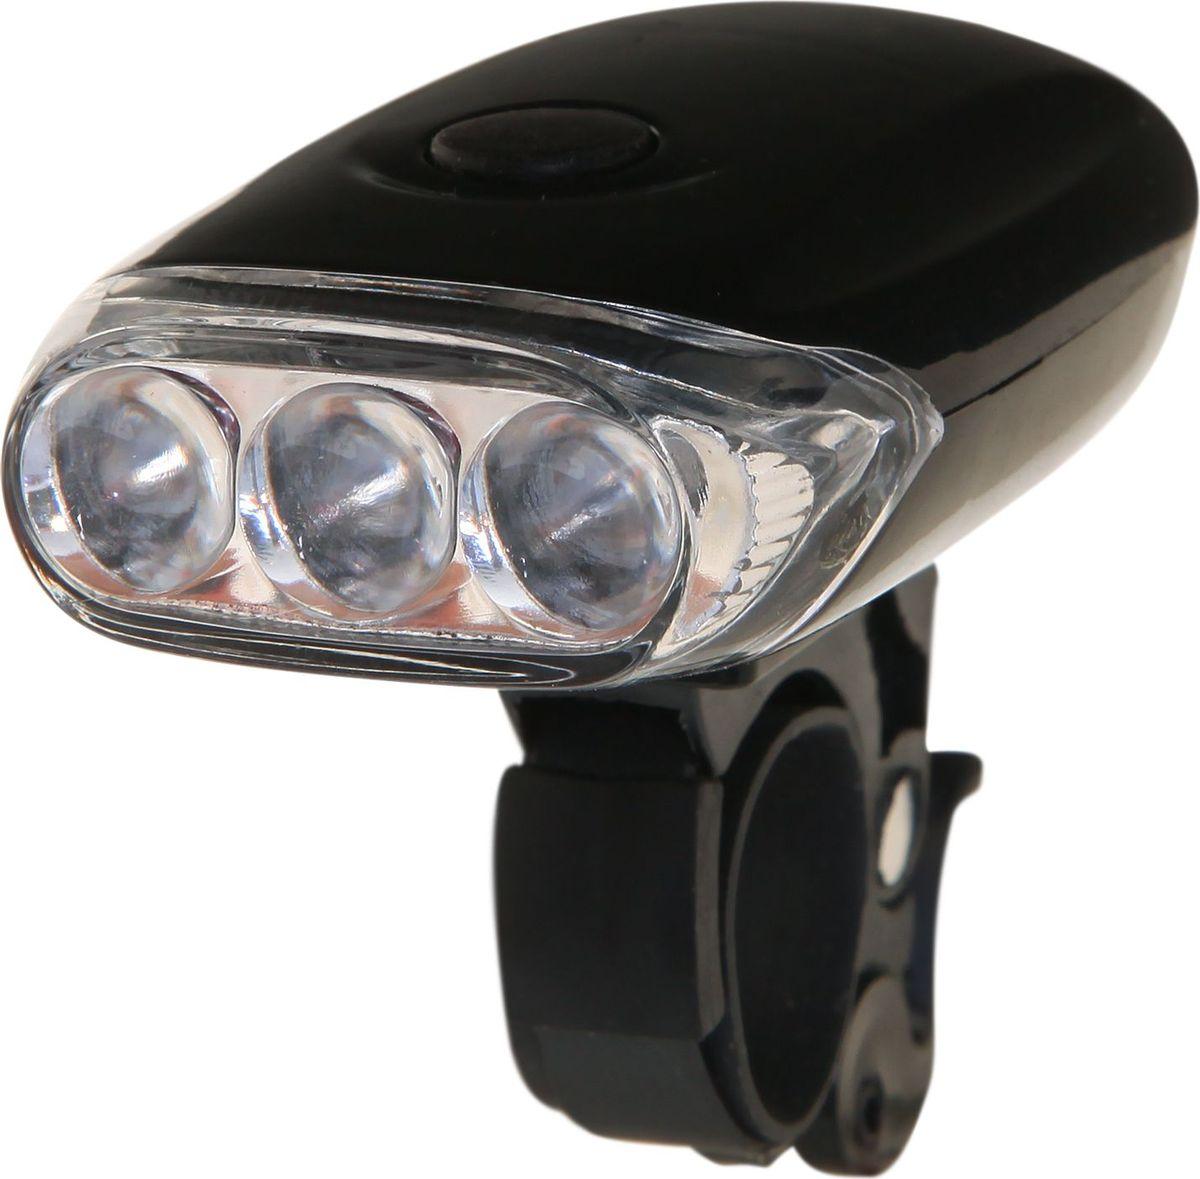 Фонарь велосипедный STG JY-567, передний фонарь на ниппель stg jy 503c 11 2 шт х54095